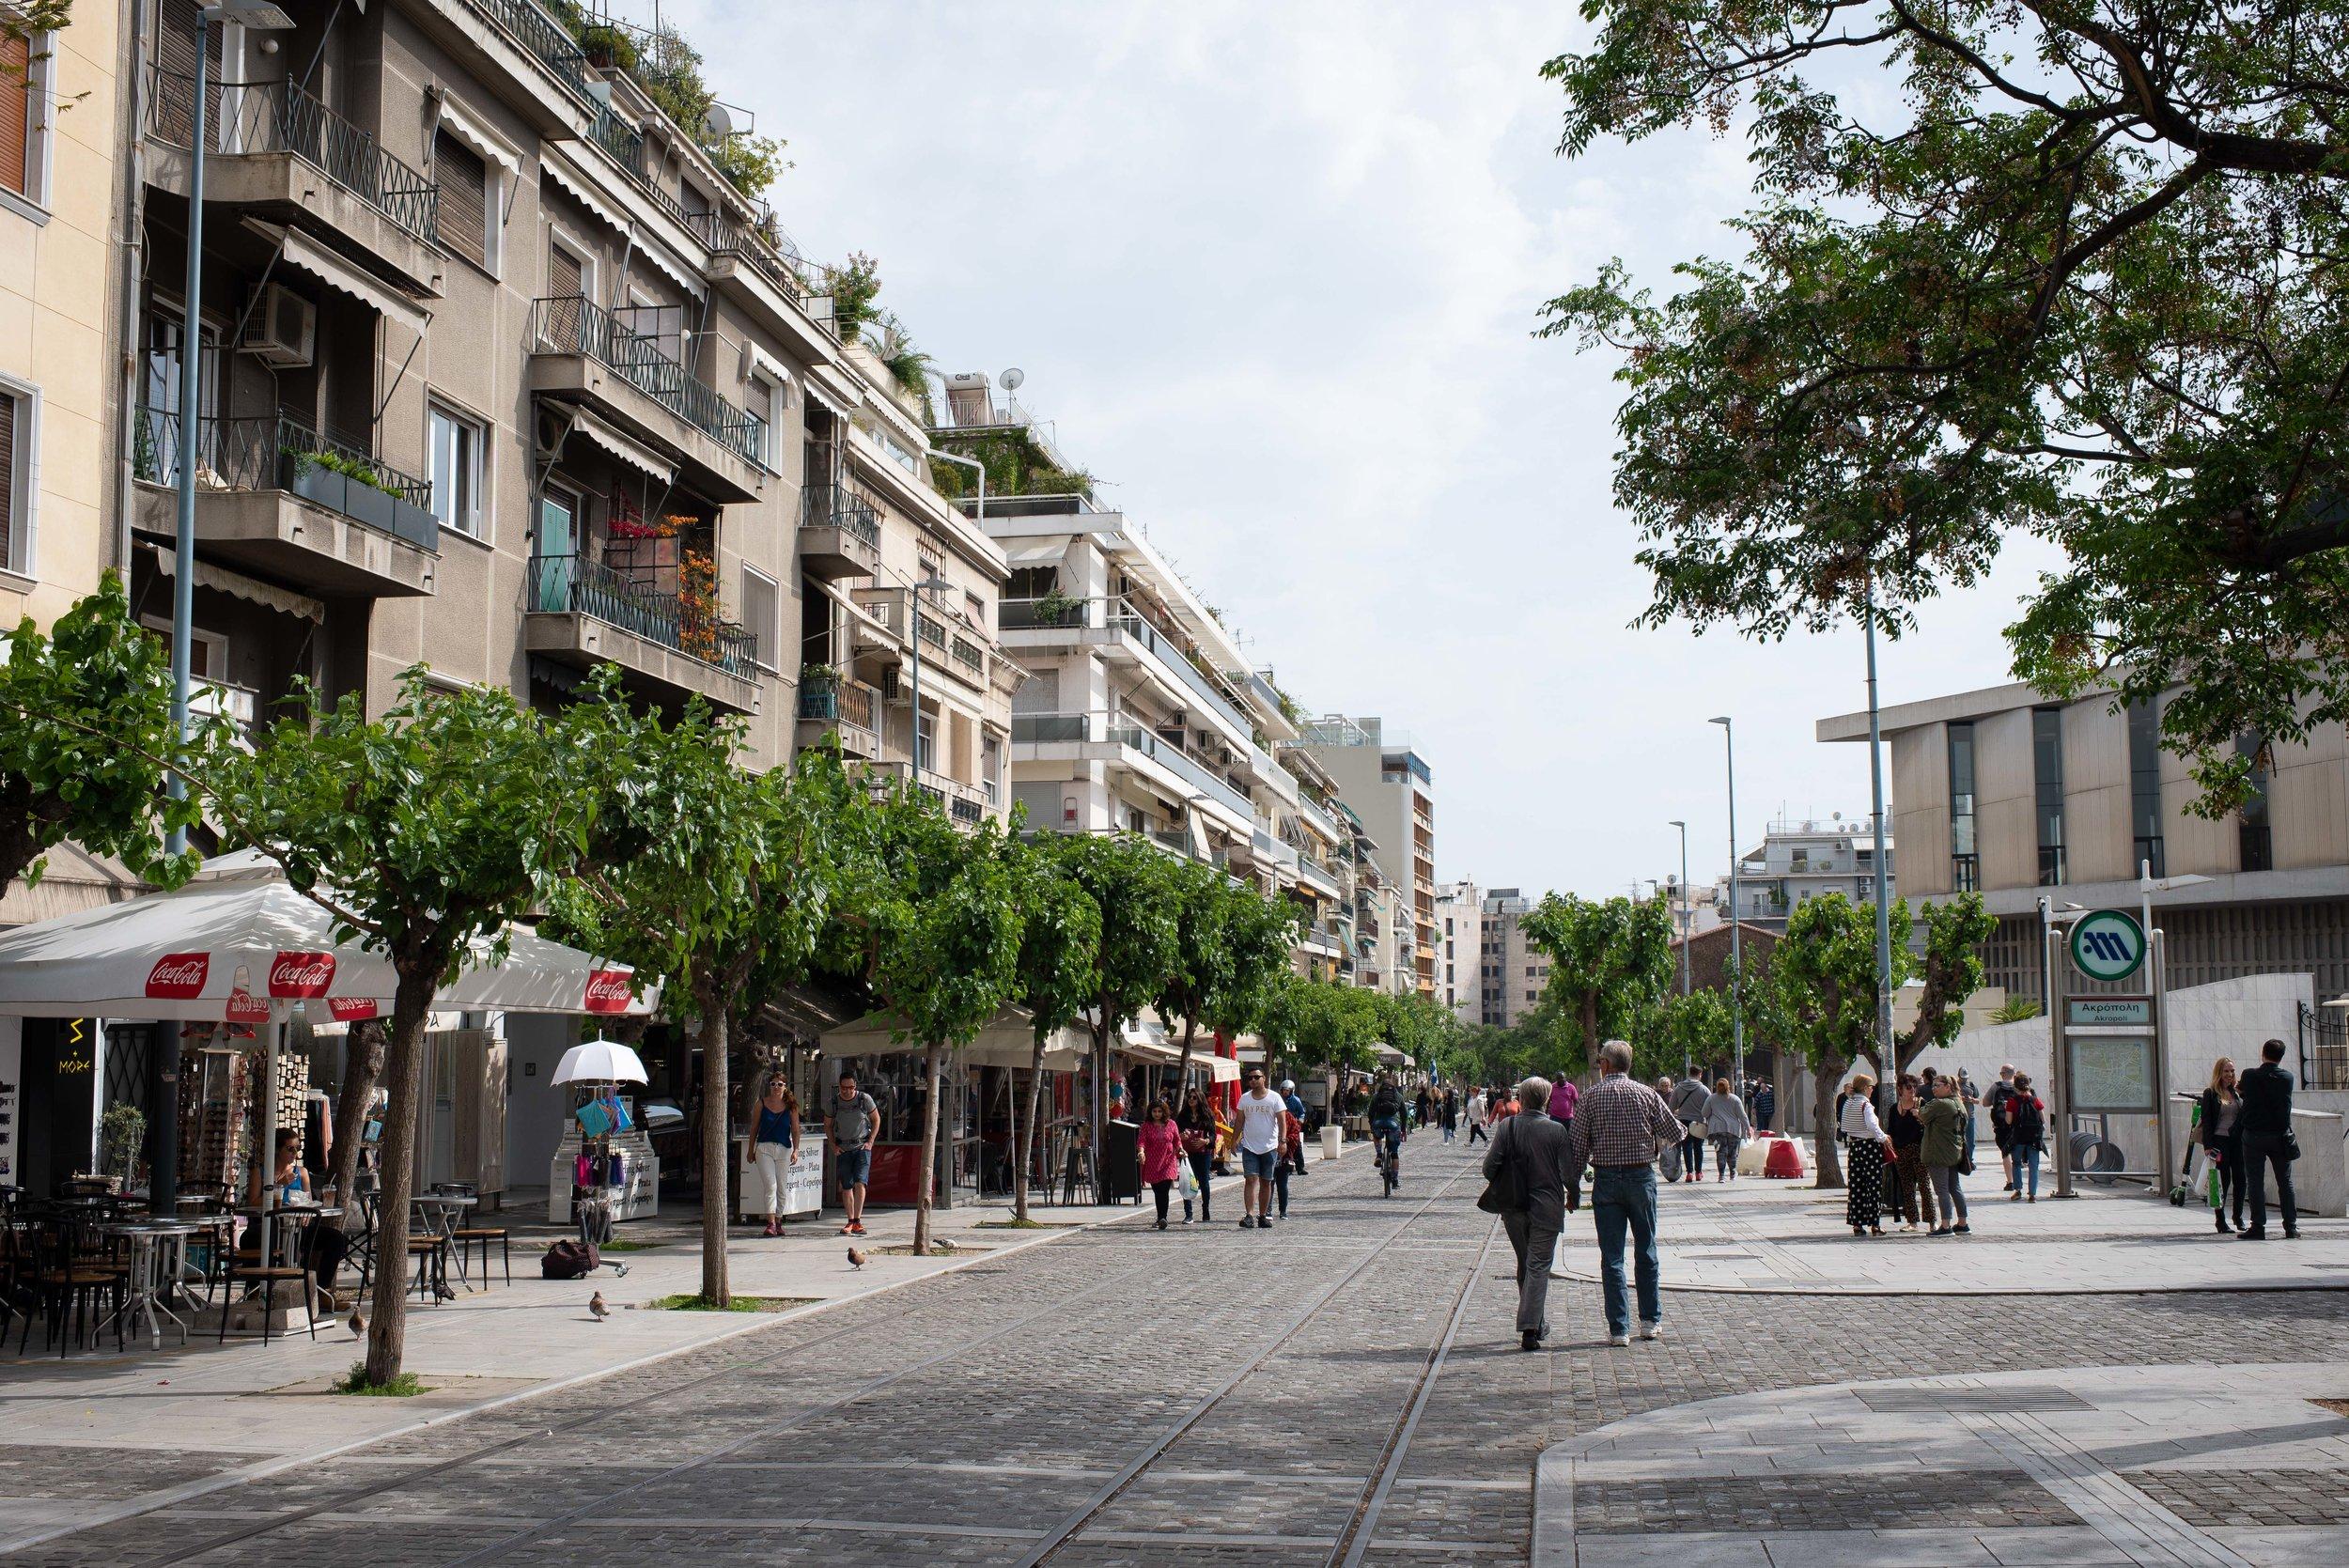 2019-May-14-Athens-Greece-076.jpg